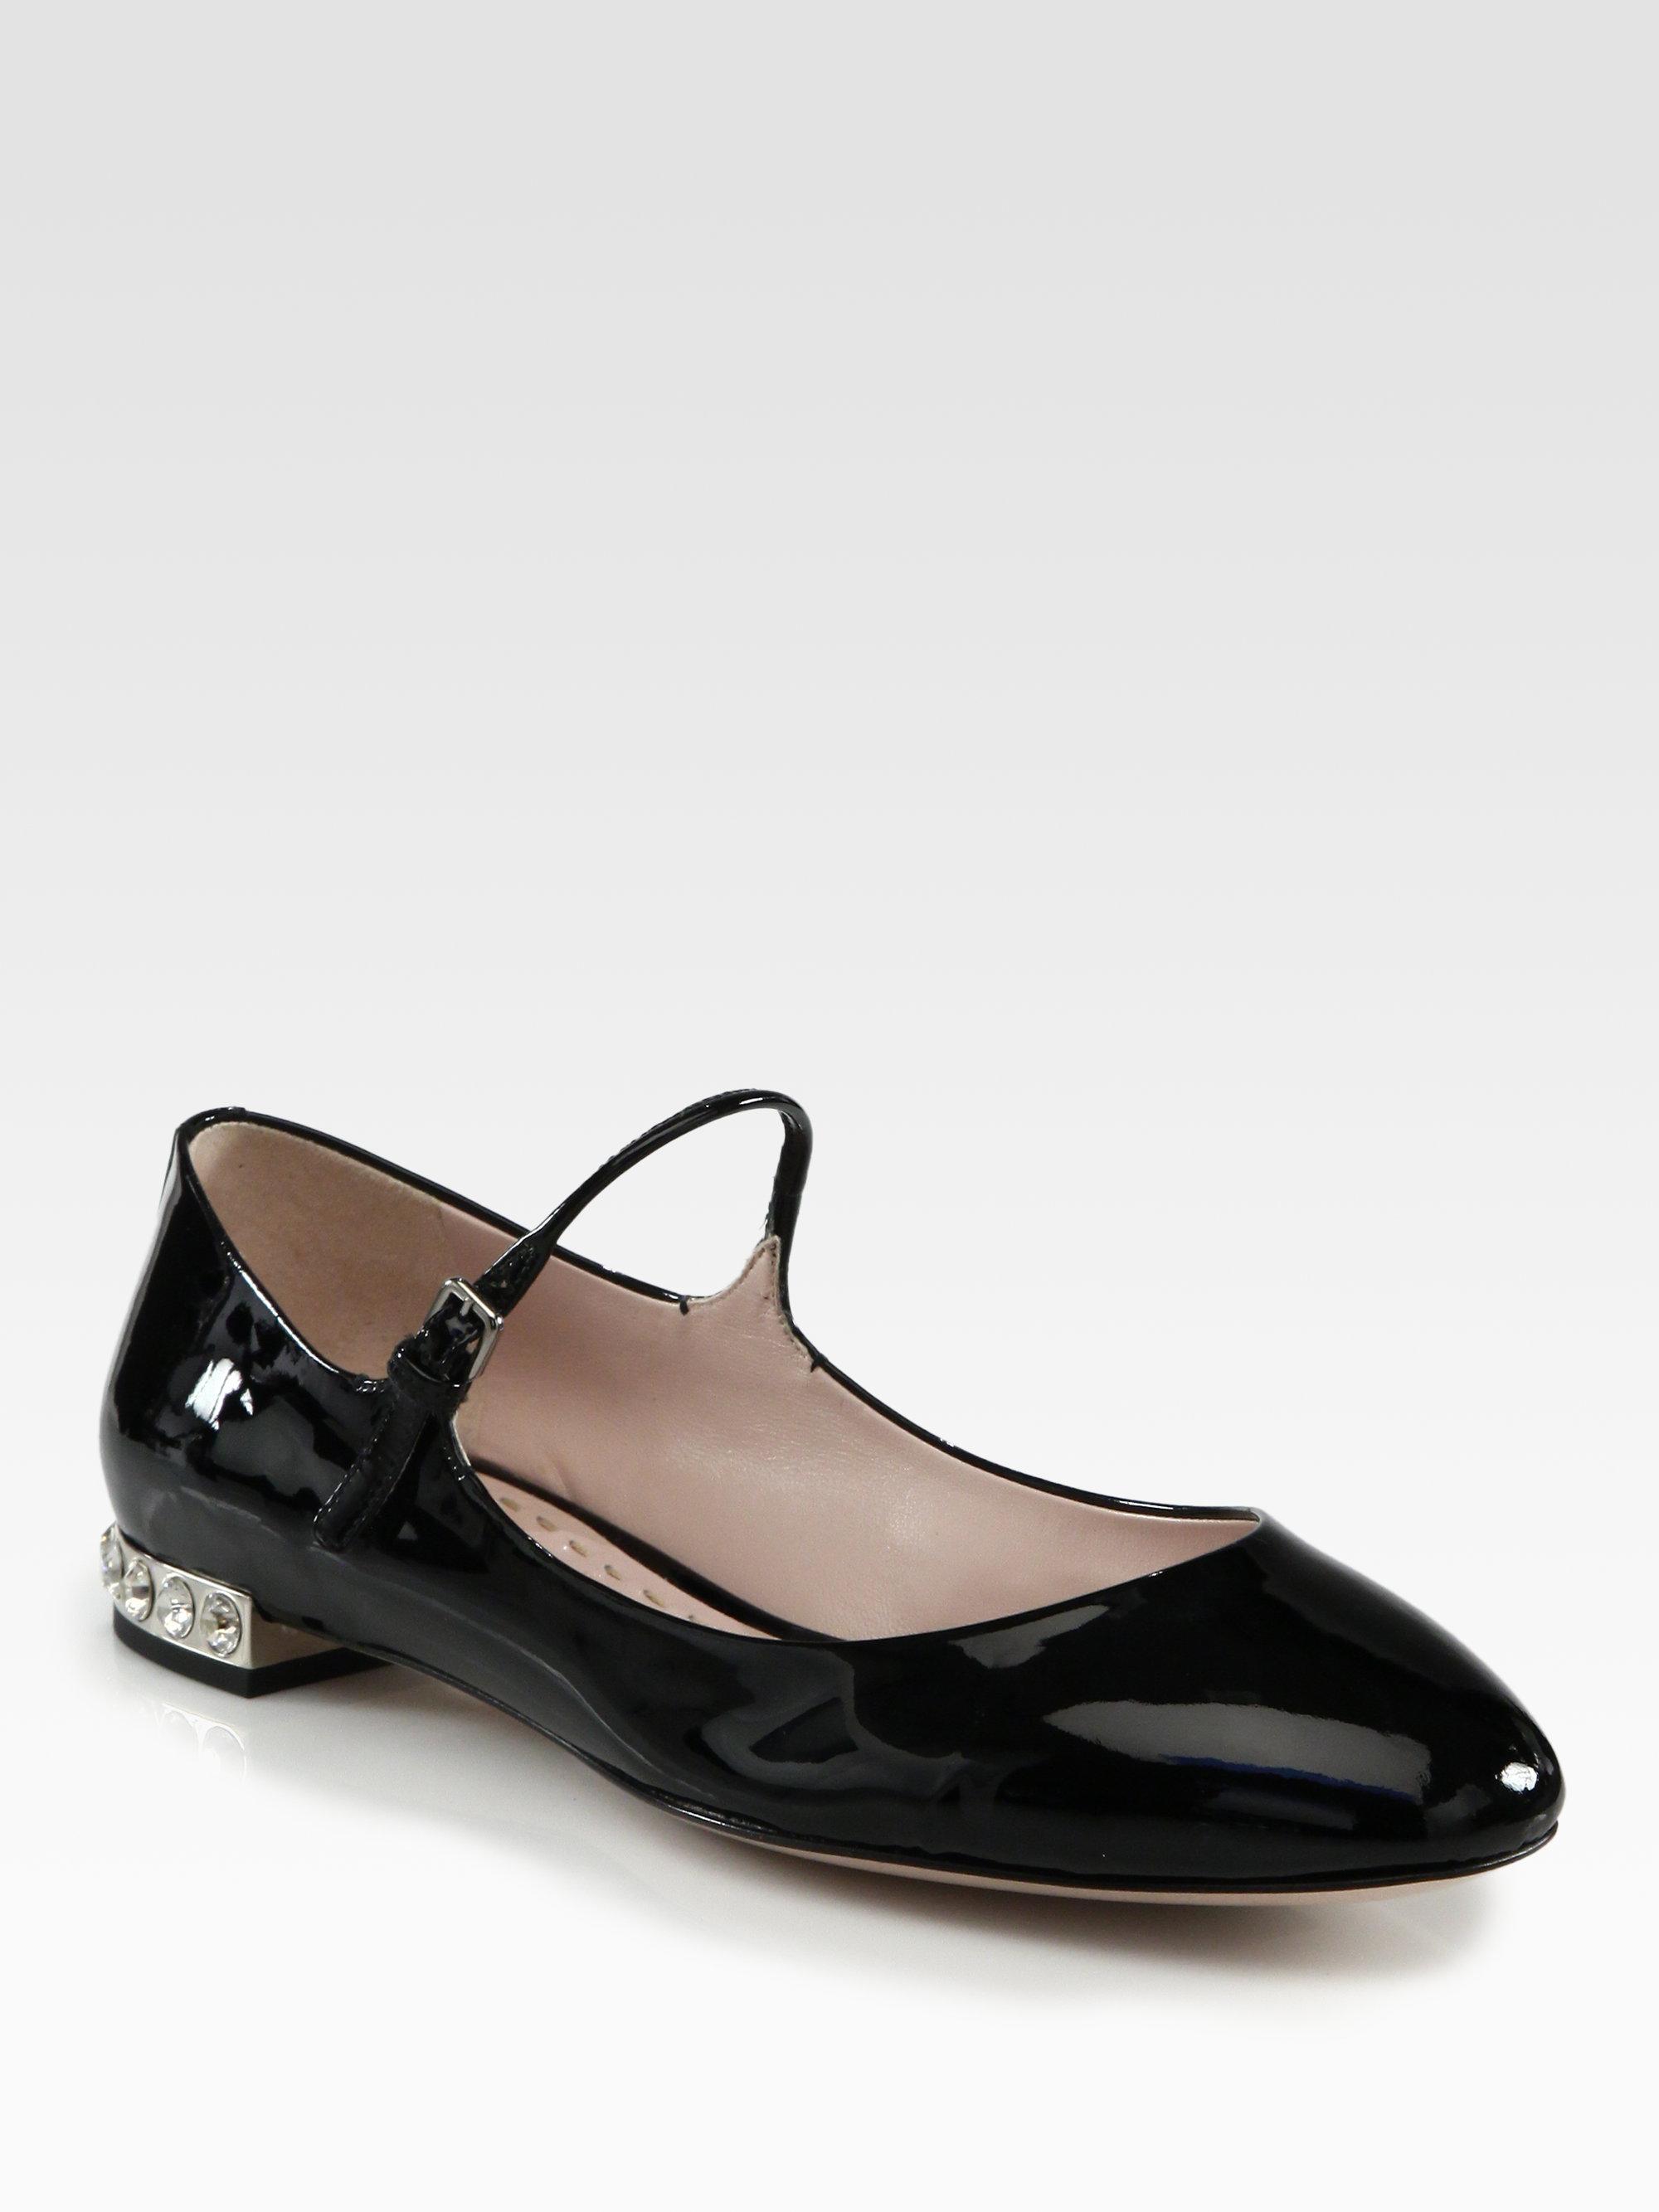 Women S Shoes Flat Heel Mary Jane Sandals